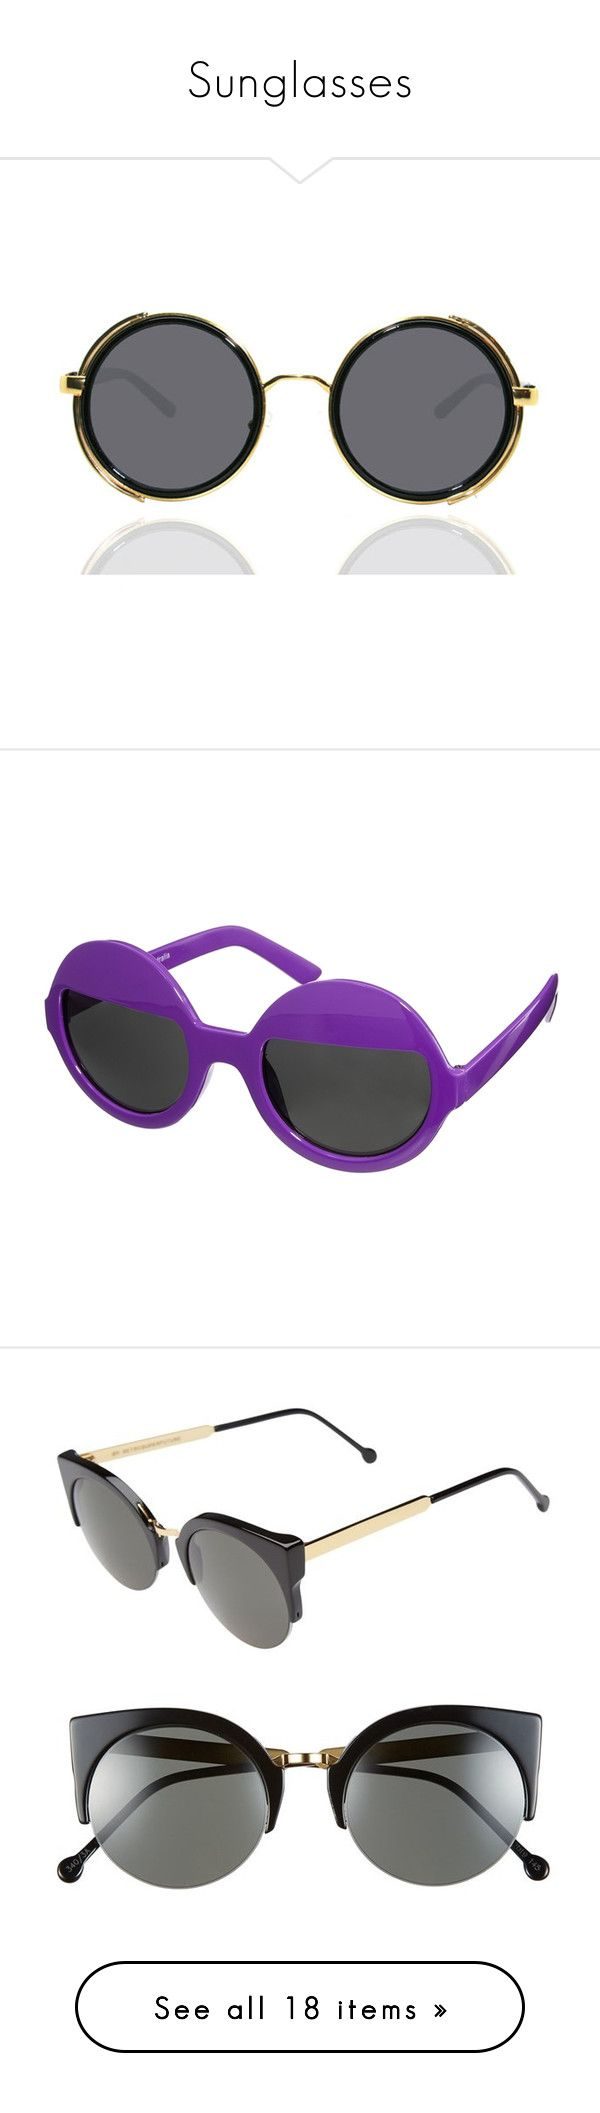 """Sunglasses"" by janinati ❤ liked on Polyvore featuring accessories, eyewear, sunglasses, uv protection sunglasses, quay eyewear, quay sunglasses, vintage style glasses, vintage style sunglasses, purple and oversized glasses"